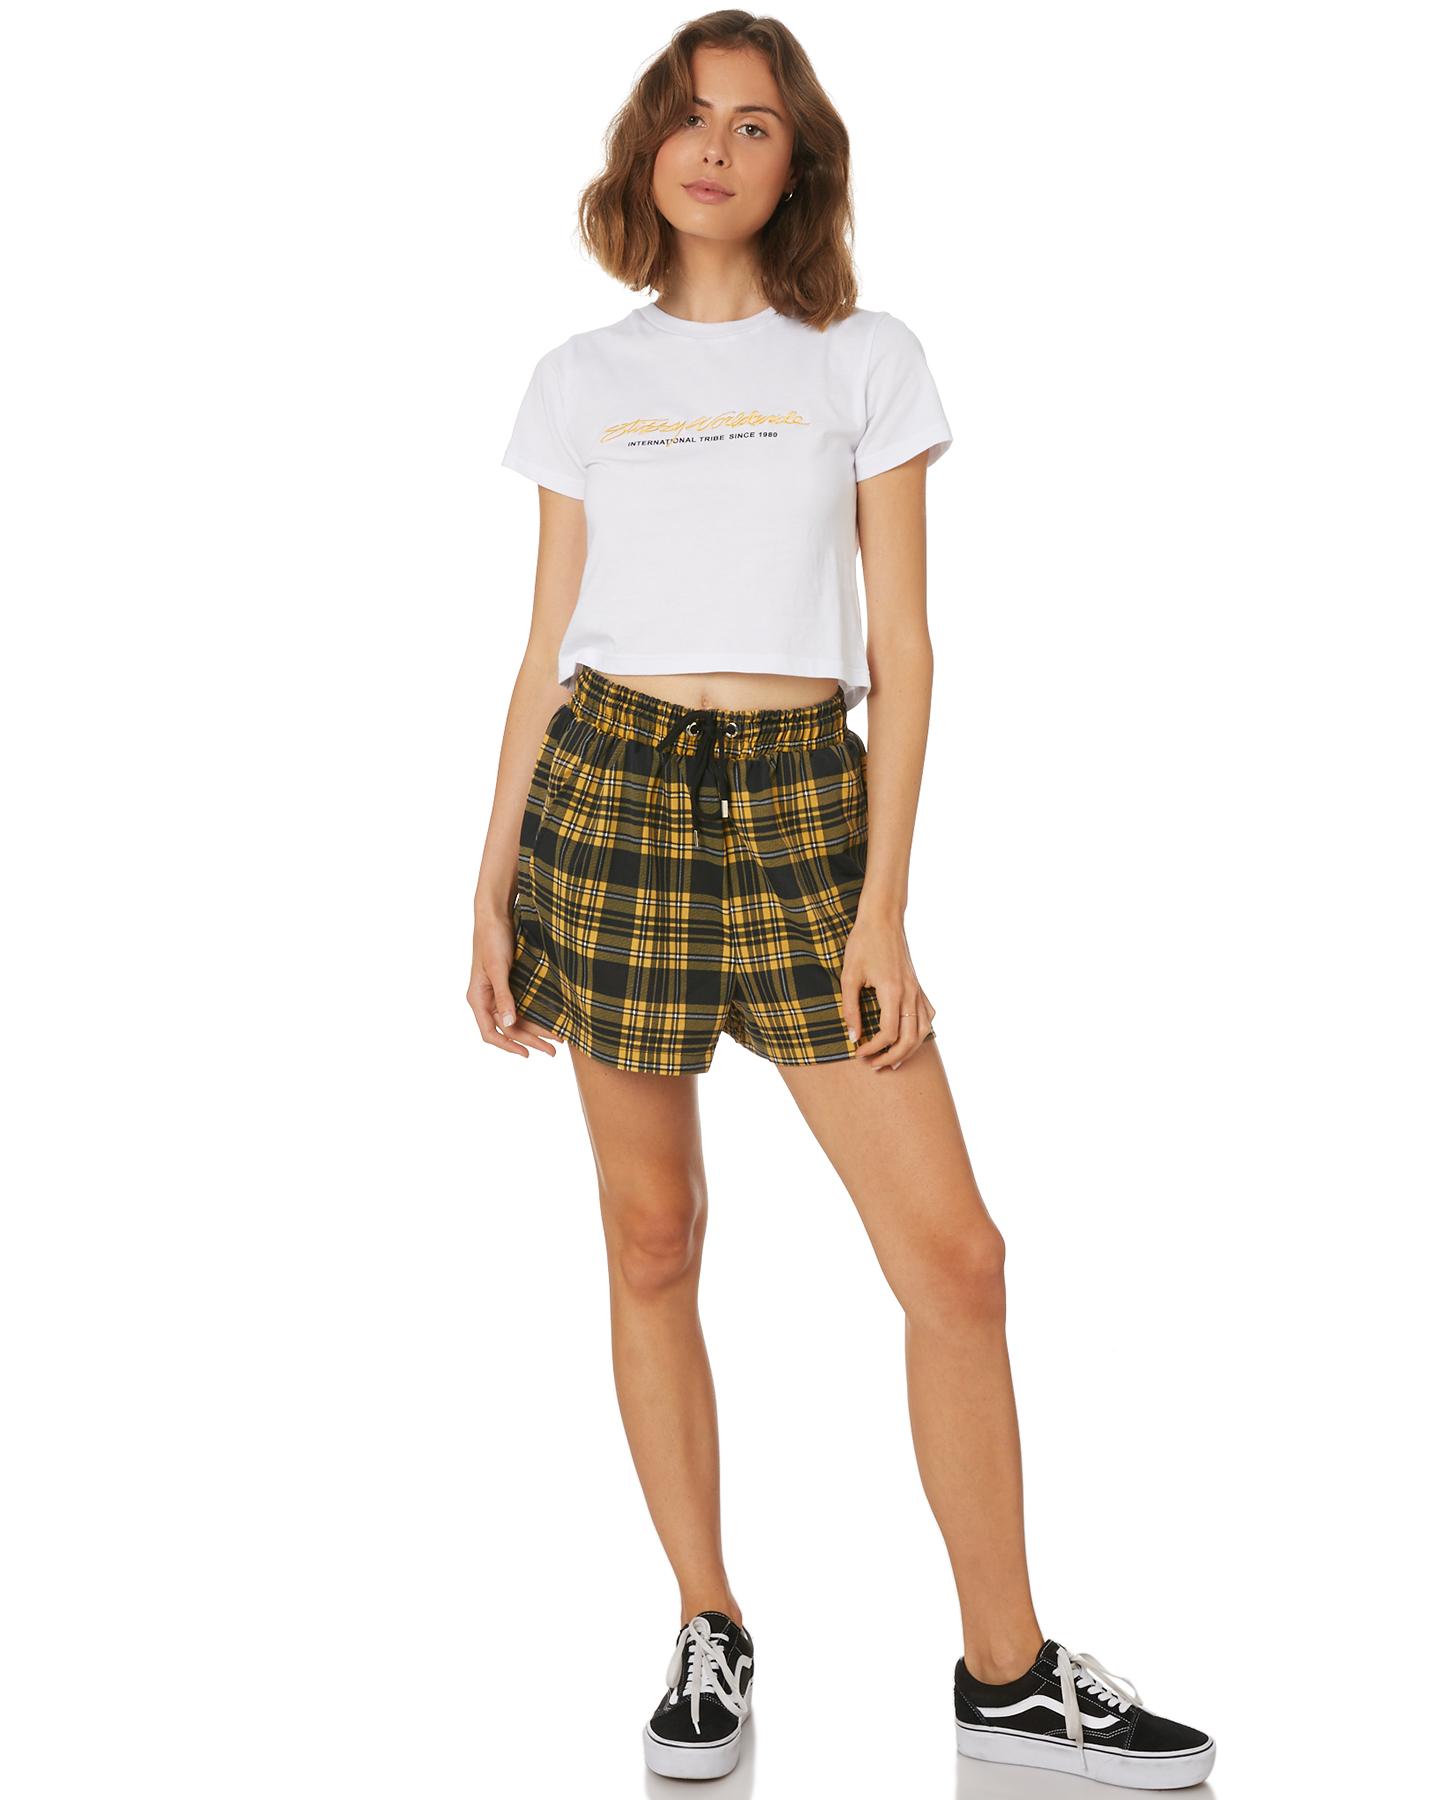 12c4b532b1e Details about Stussy Women s Lover Crop Tee Crew Neck Short Sleeve Cotton  White